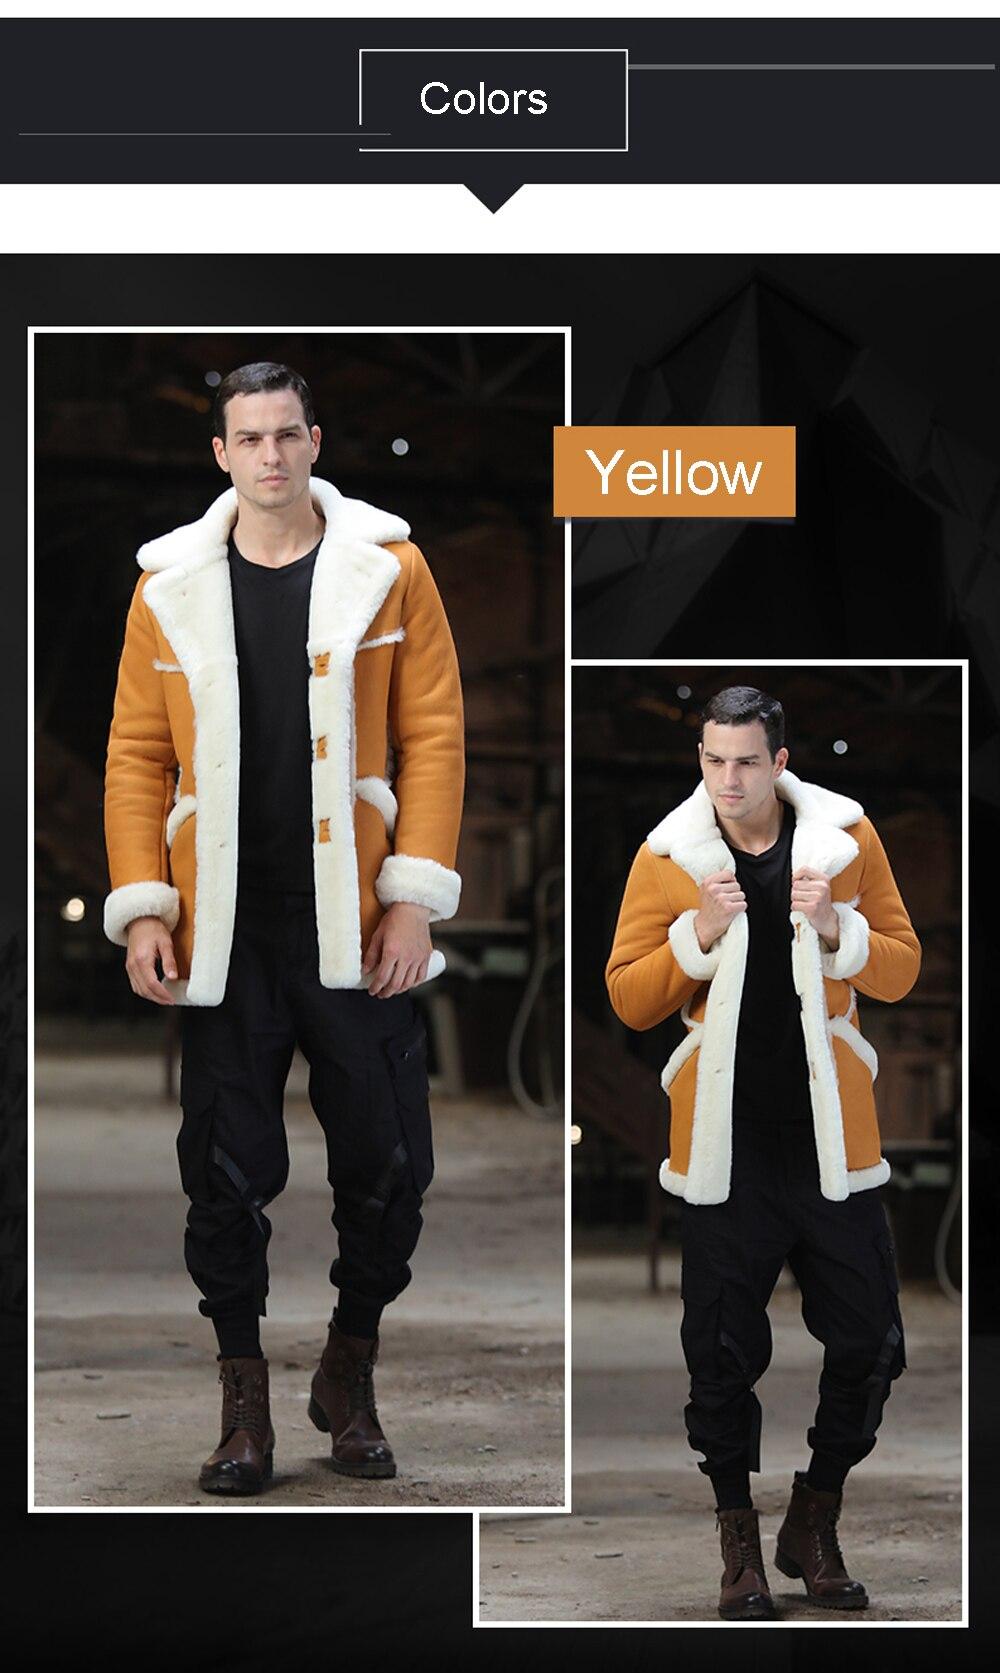 H86da7896889f41fb98501751358bffc3v Men Luxury Fur Shearling Coat Yellow Soft Thicken Fur Coat Winter Male Formal Business Fur Sheepskin Jackets